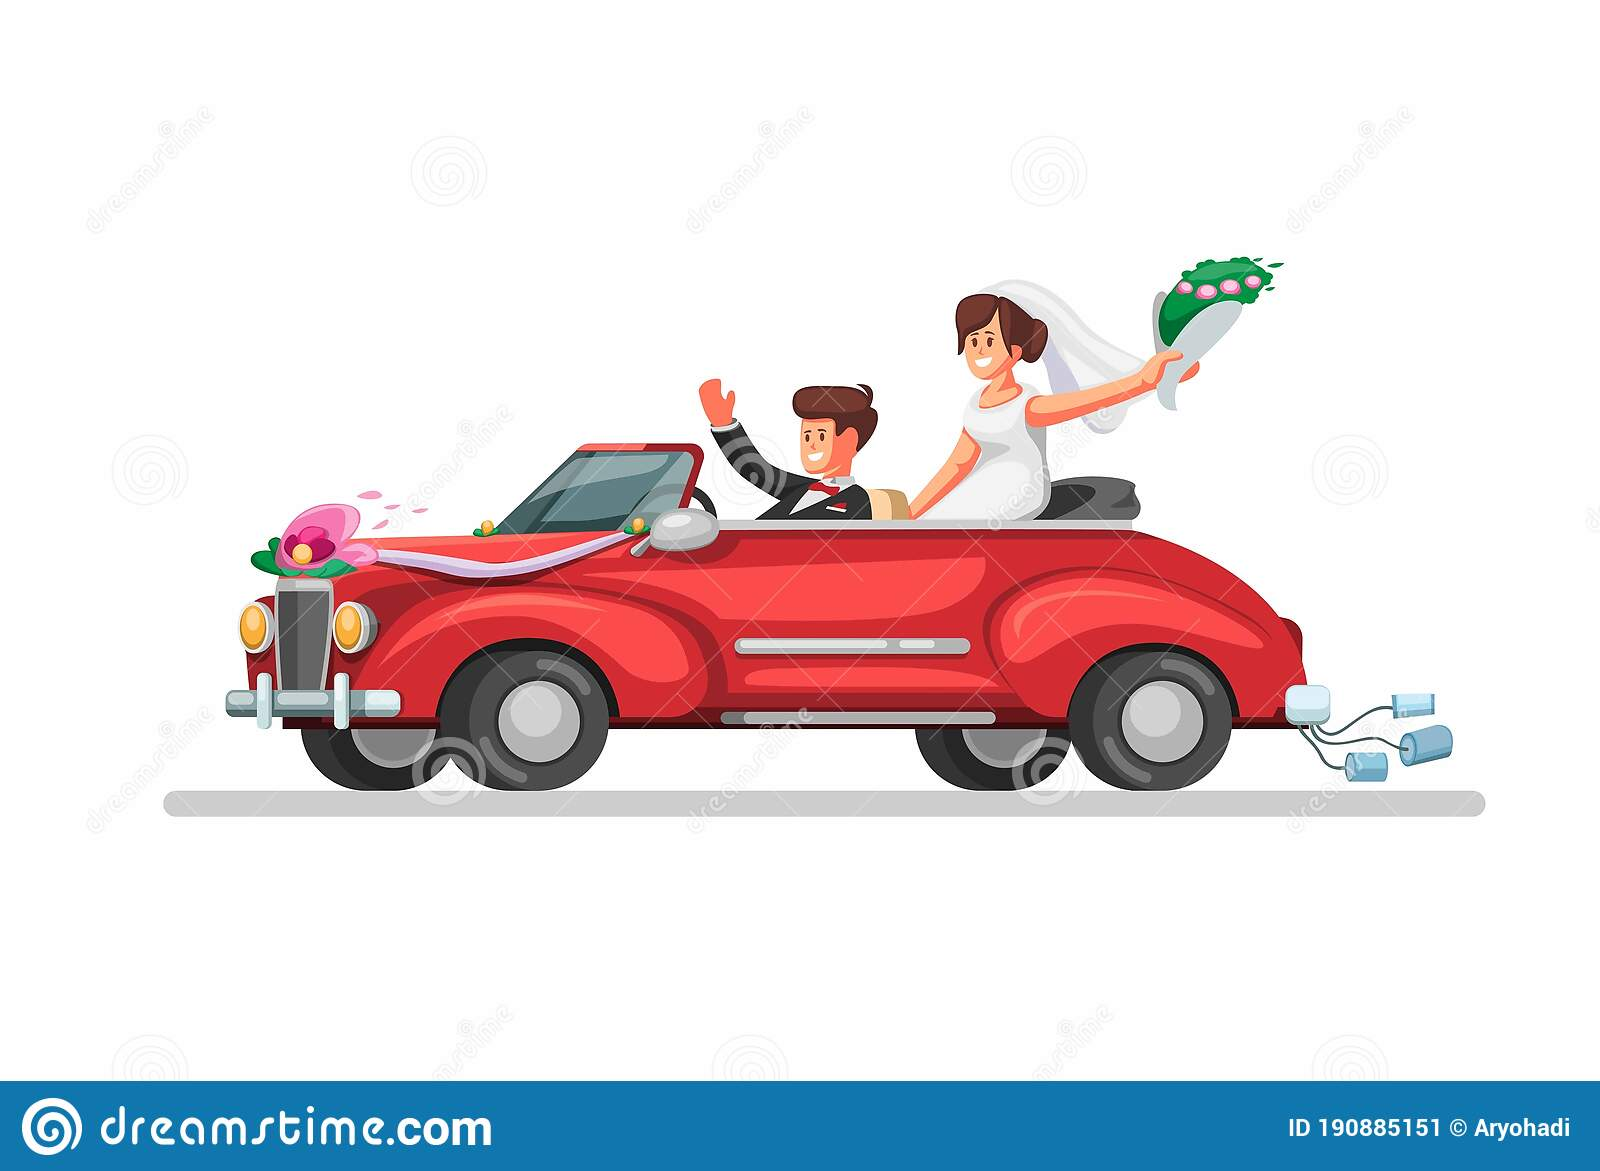 Convertible Car Cartoon Stock Illustrations 1 316 Convertible Car Cartoon Stock Illustrations Vectors Clipart Dreamstime